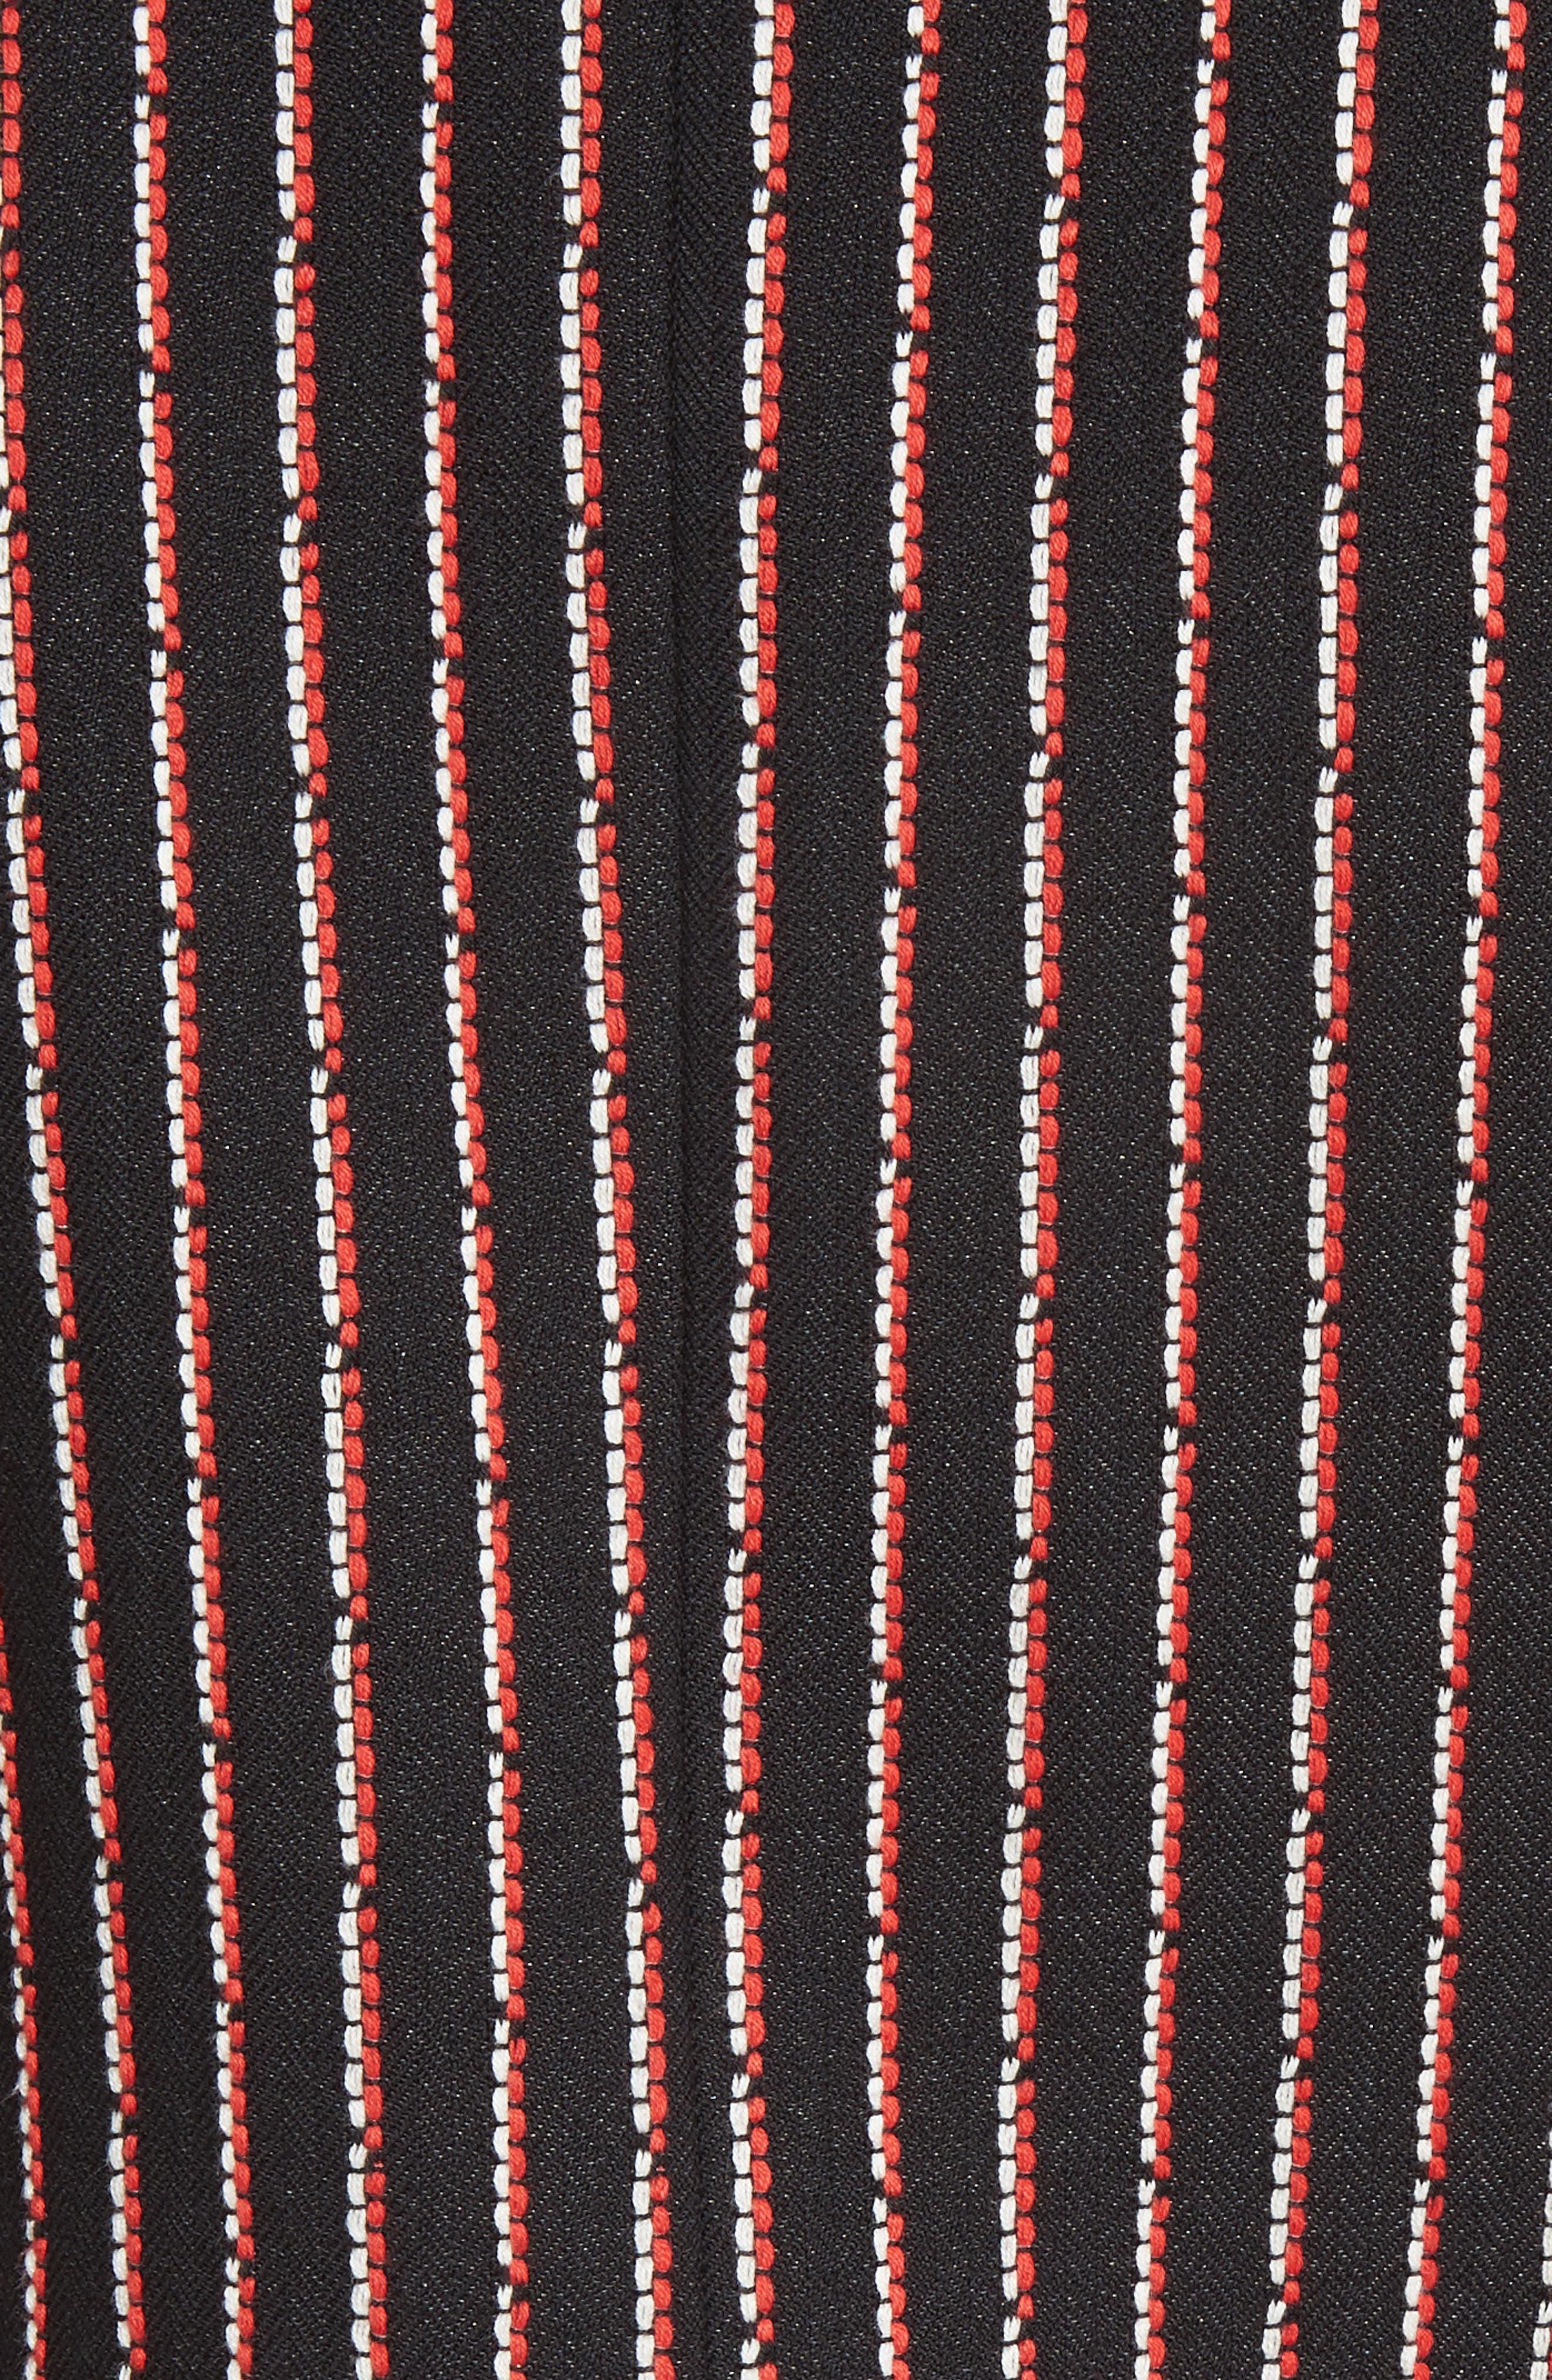 Pinstripe Double Breasted Blazer,                             Alternate thumbnail 6, color,                             Black White Persimmon